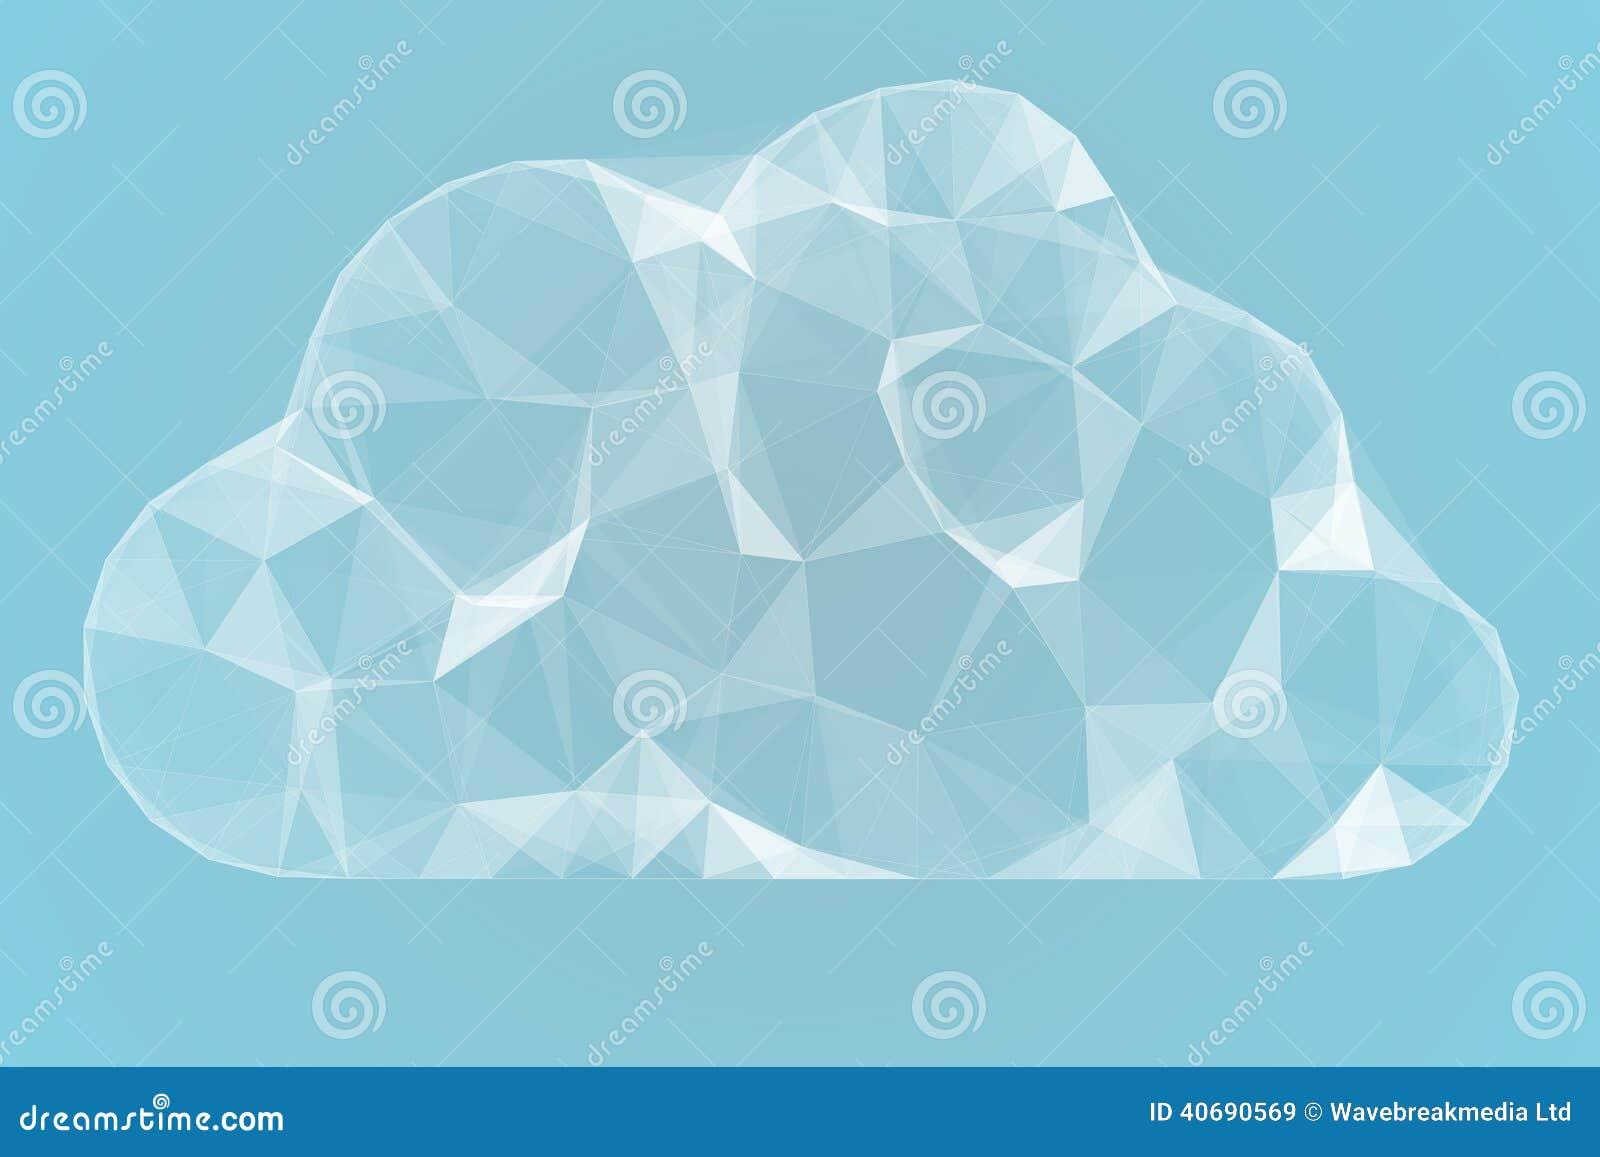 Angular Cloud Design In White Stock Illustration - Image ...